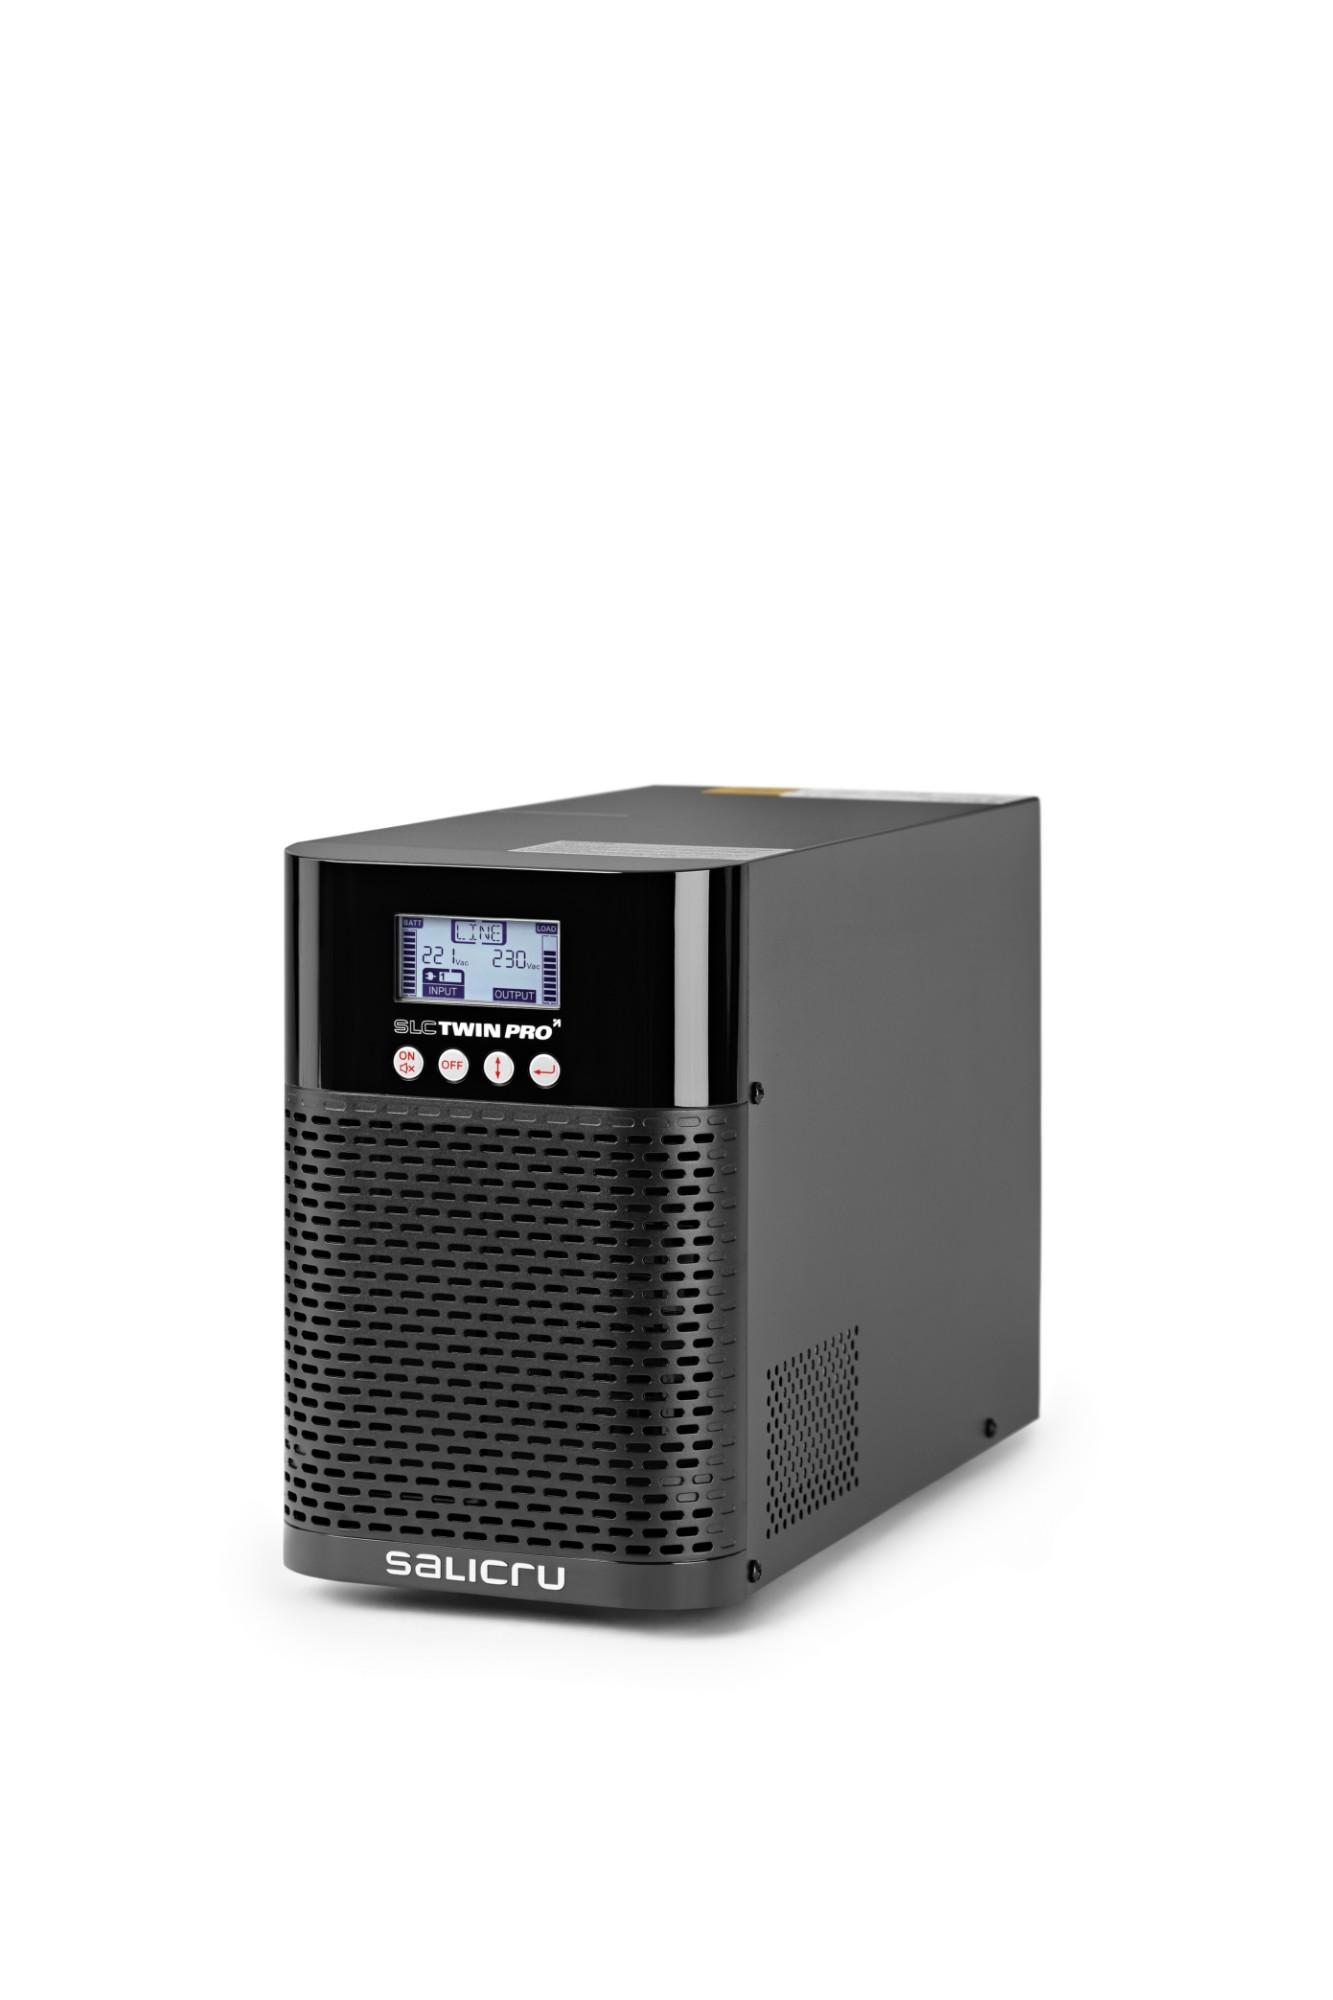 Salicru SLC 1000 TWIN PRO2 SAI On-line doble conversión de 700 VA a 3000 VA